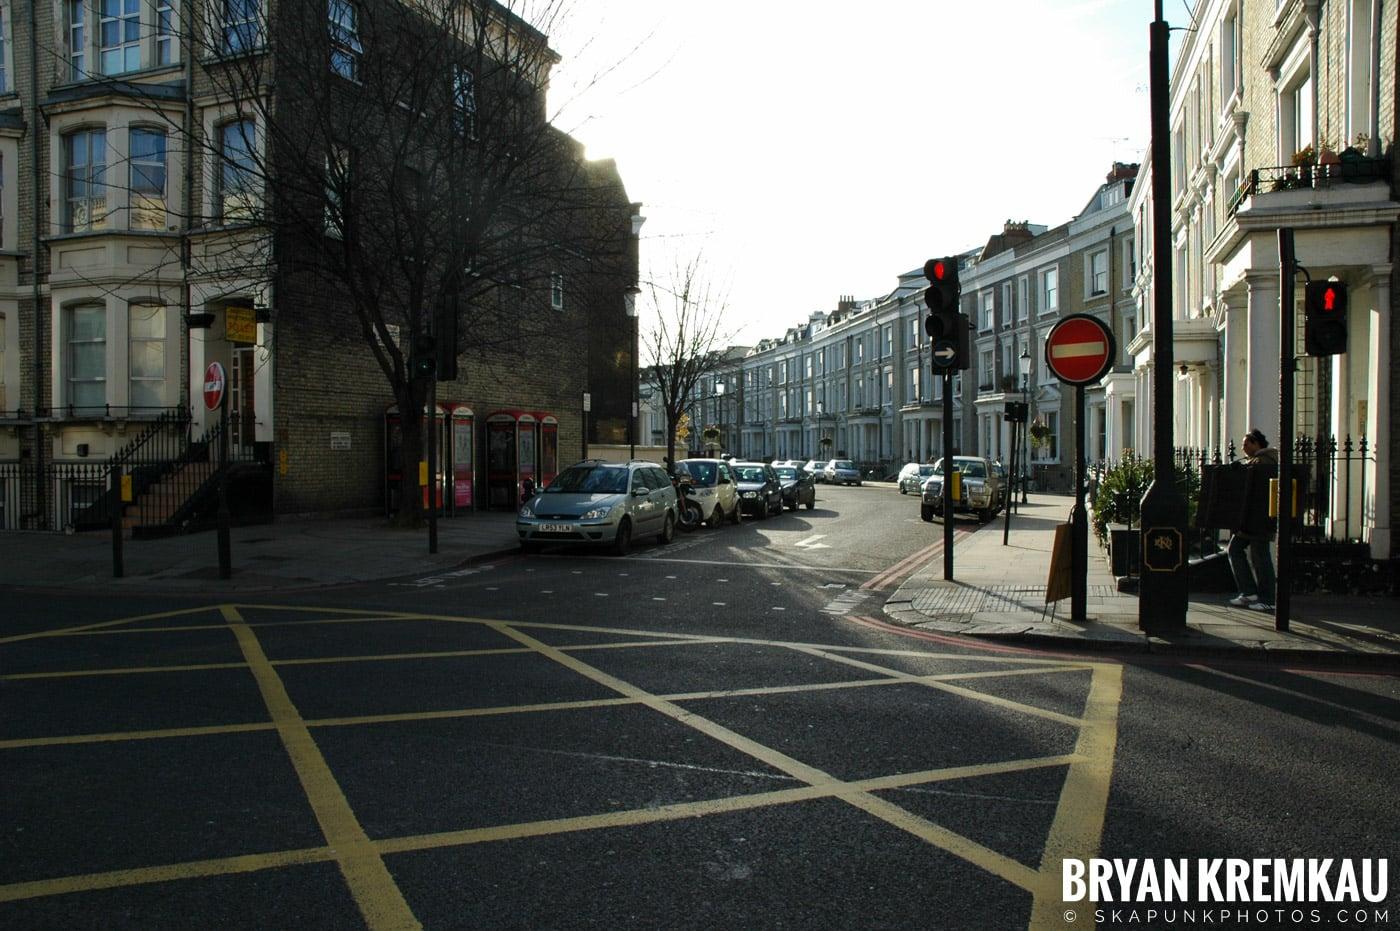 London, England - Day 2 - 12.17.05 (22)